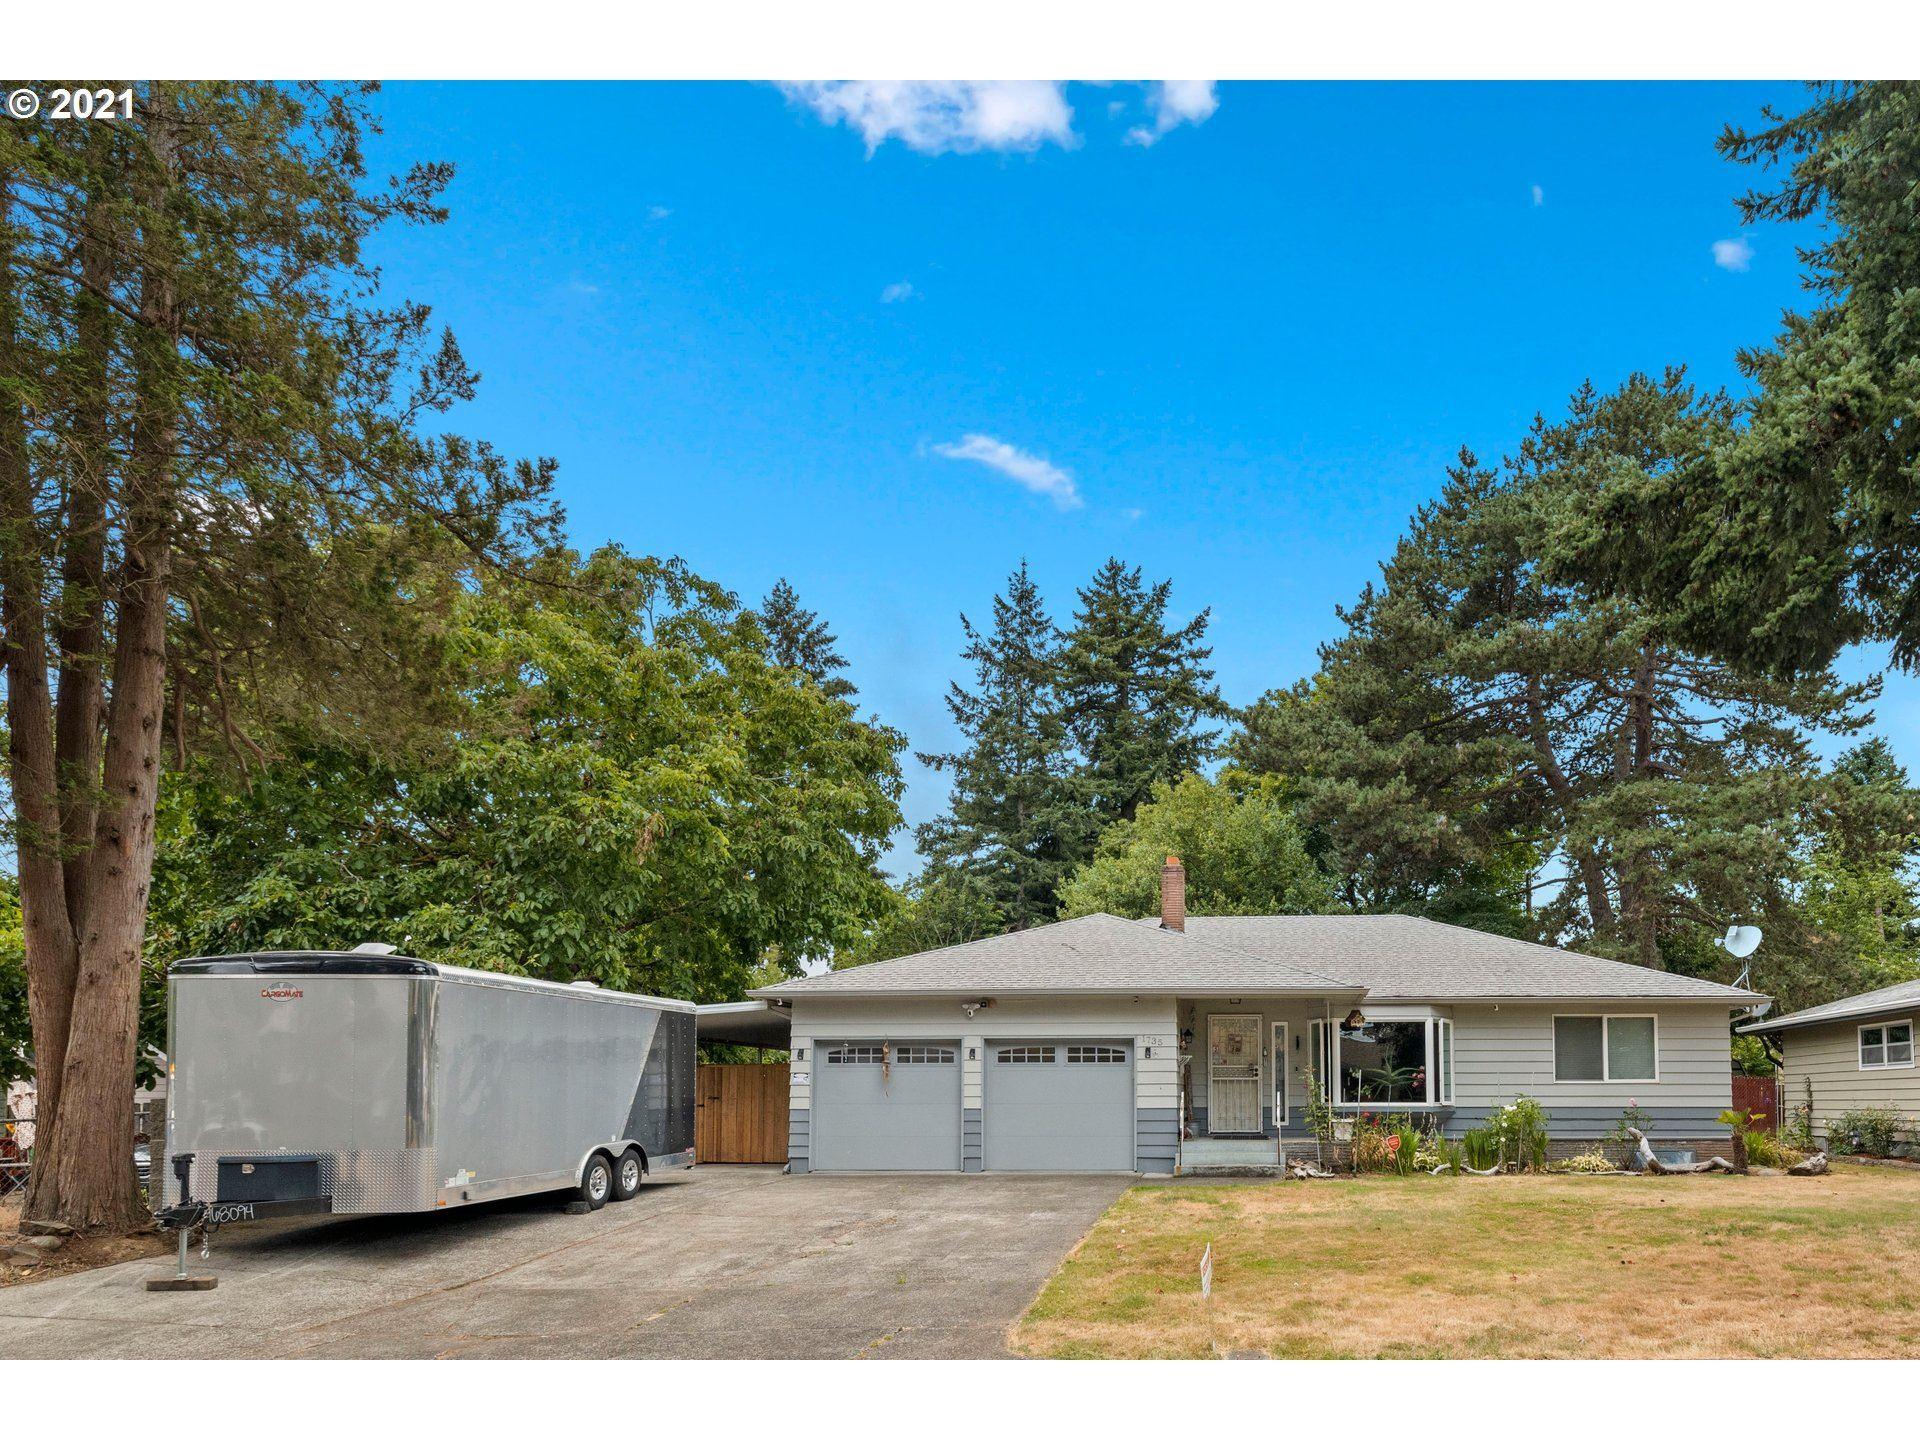 1735 SE 150TH AVE, Portland, OR 97233 - #: 21394430